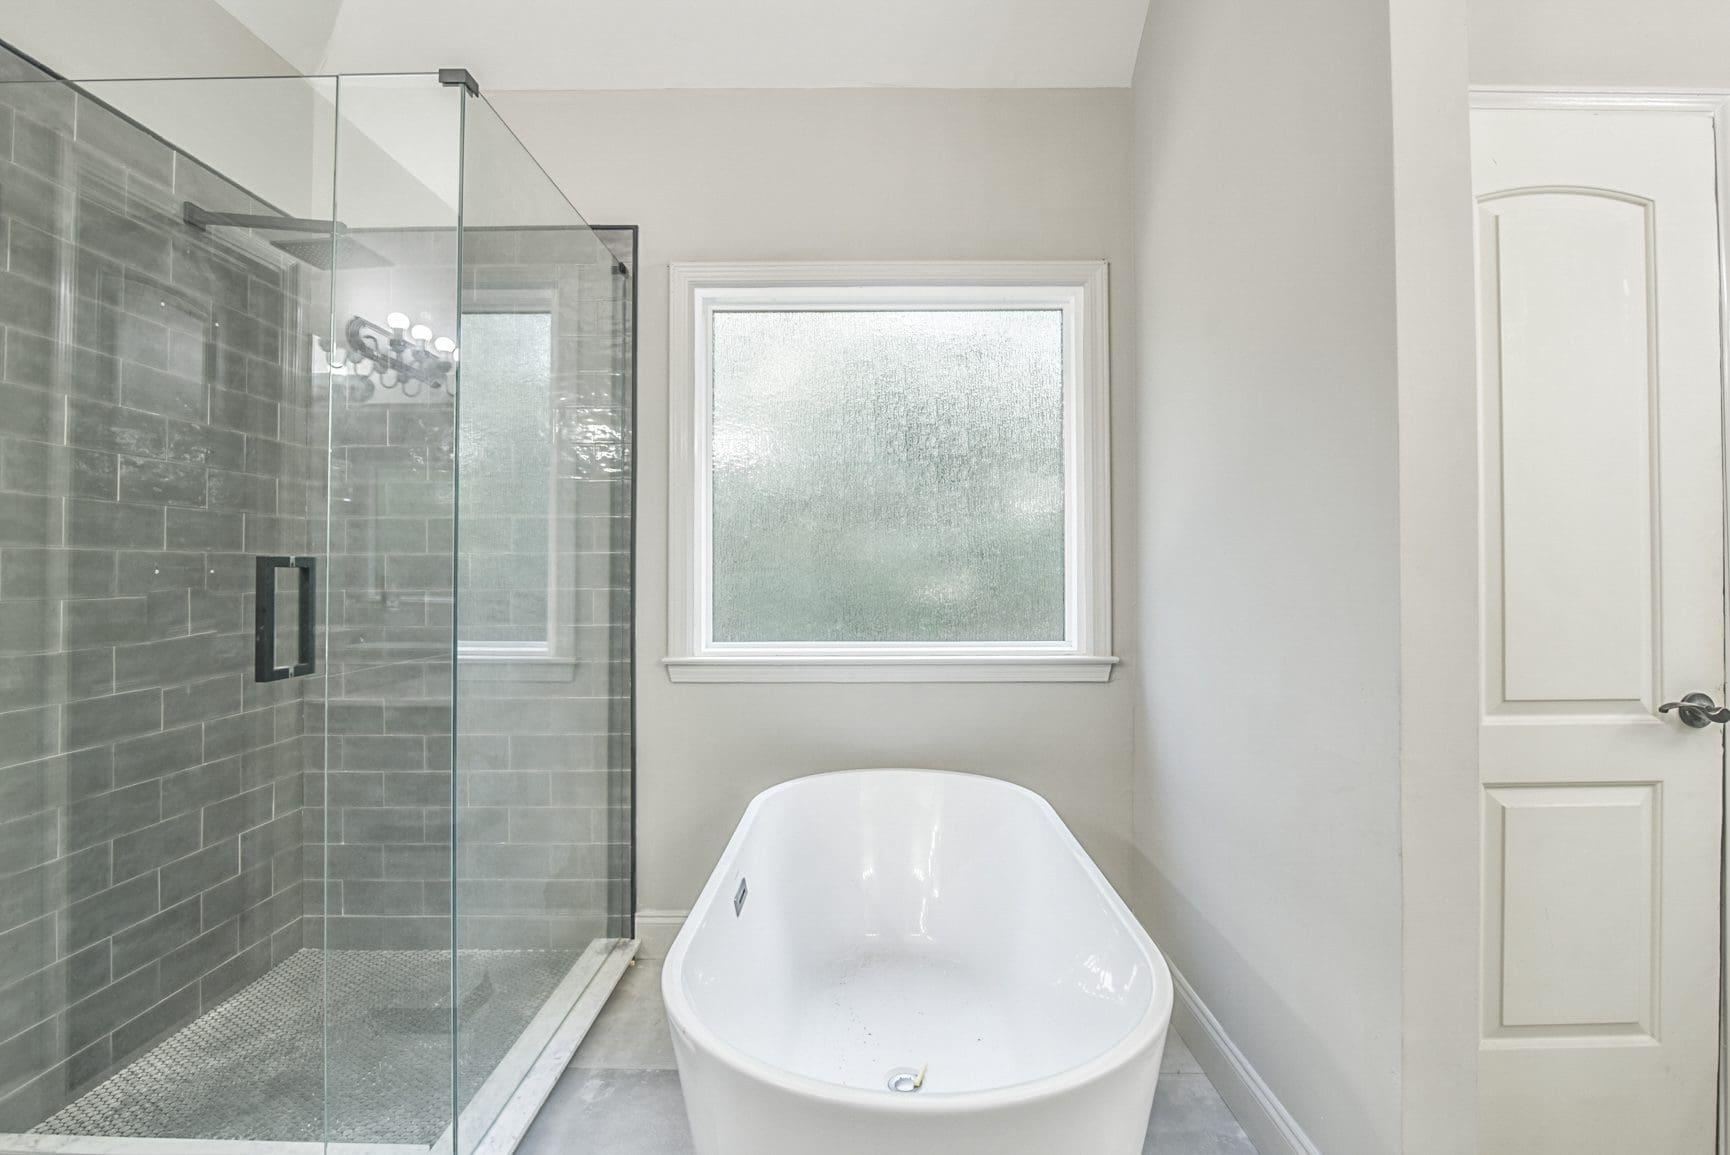 Rainglass Bathroom Window   Gwinnett County, GA   The Window ...